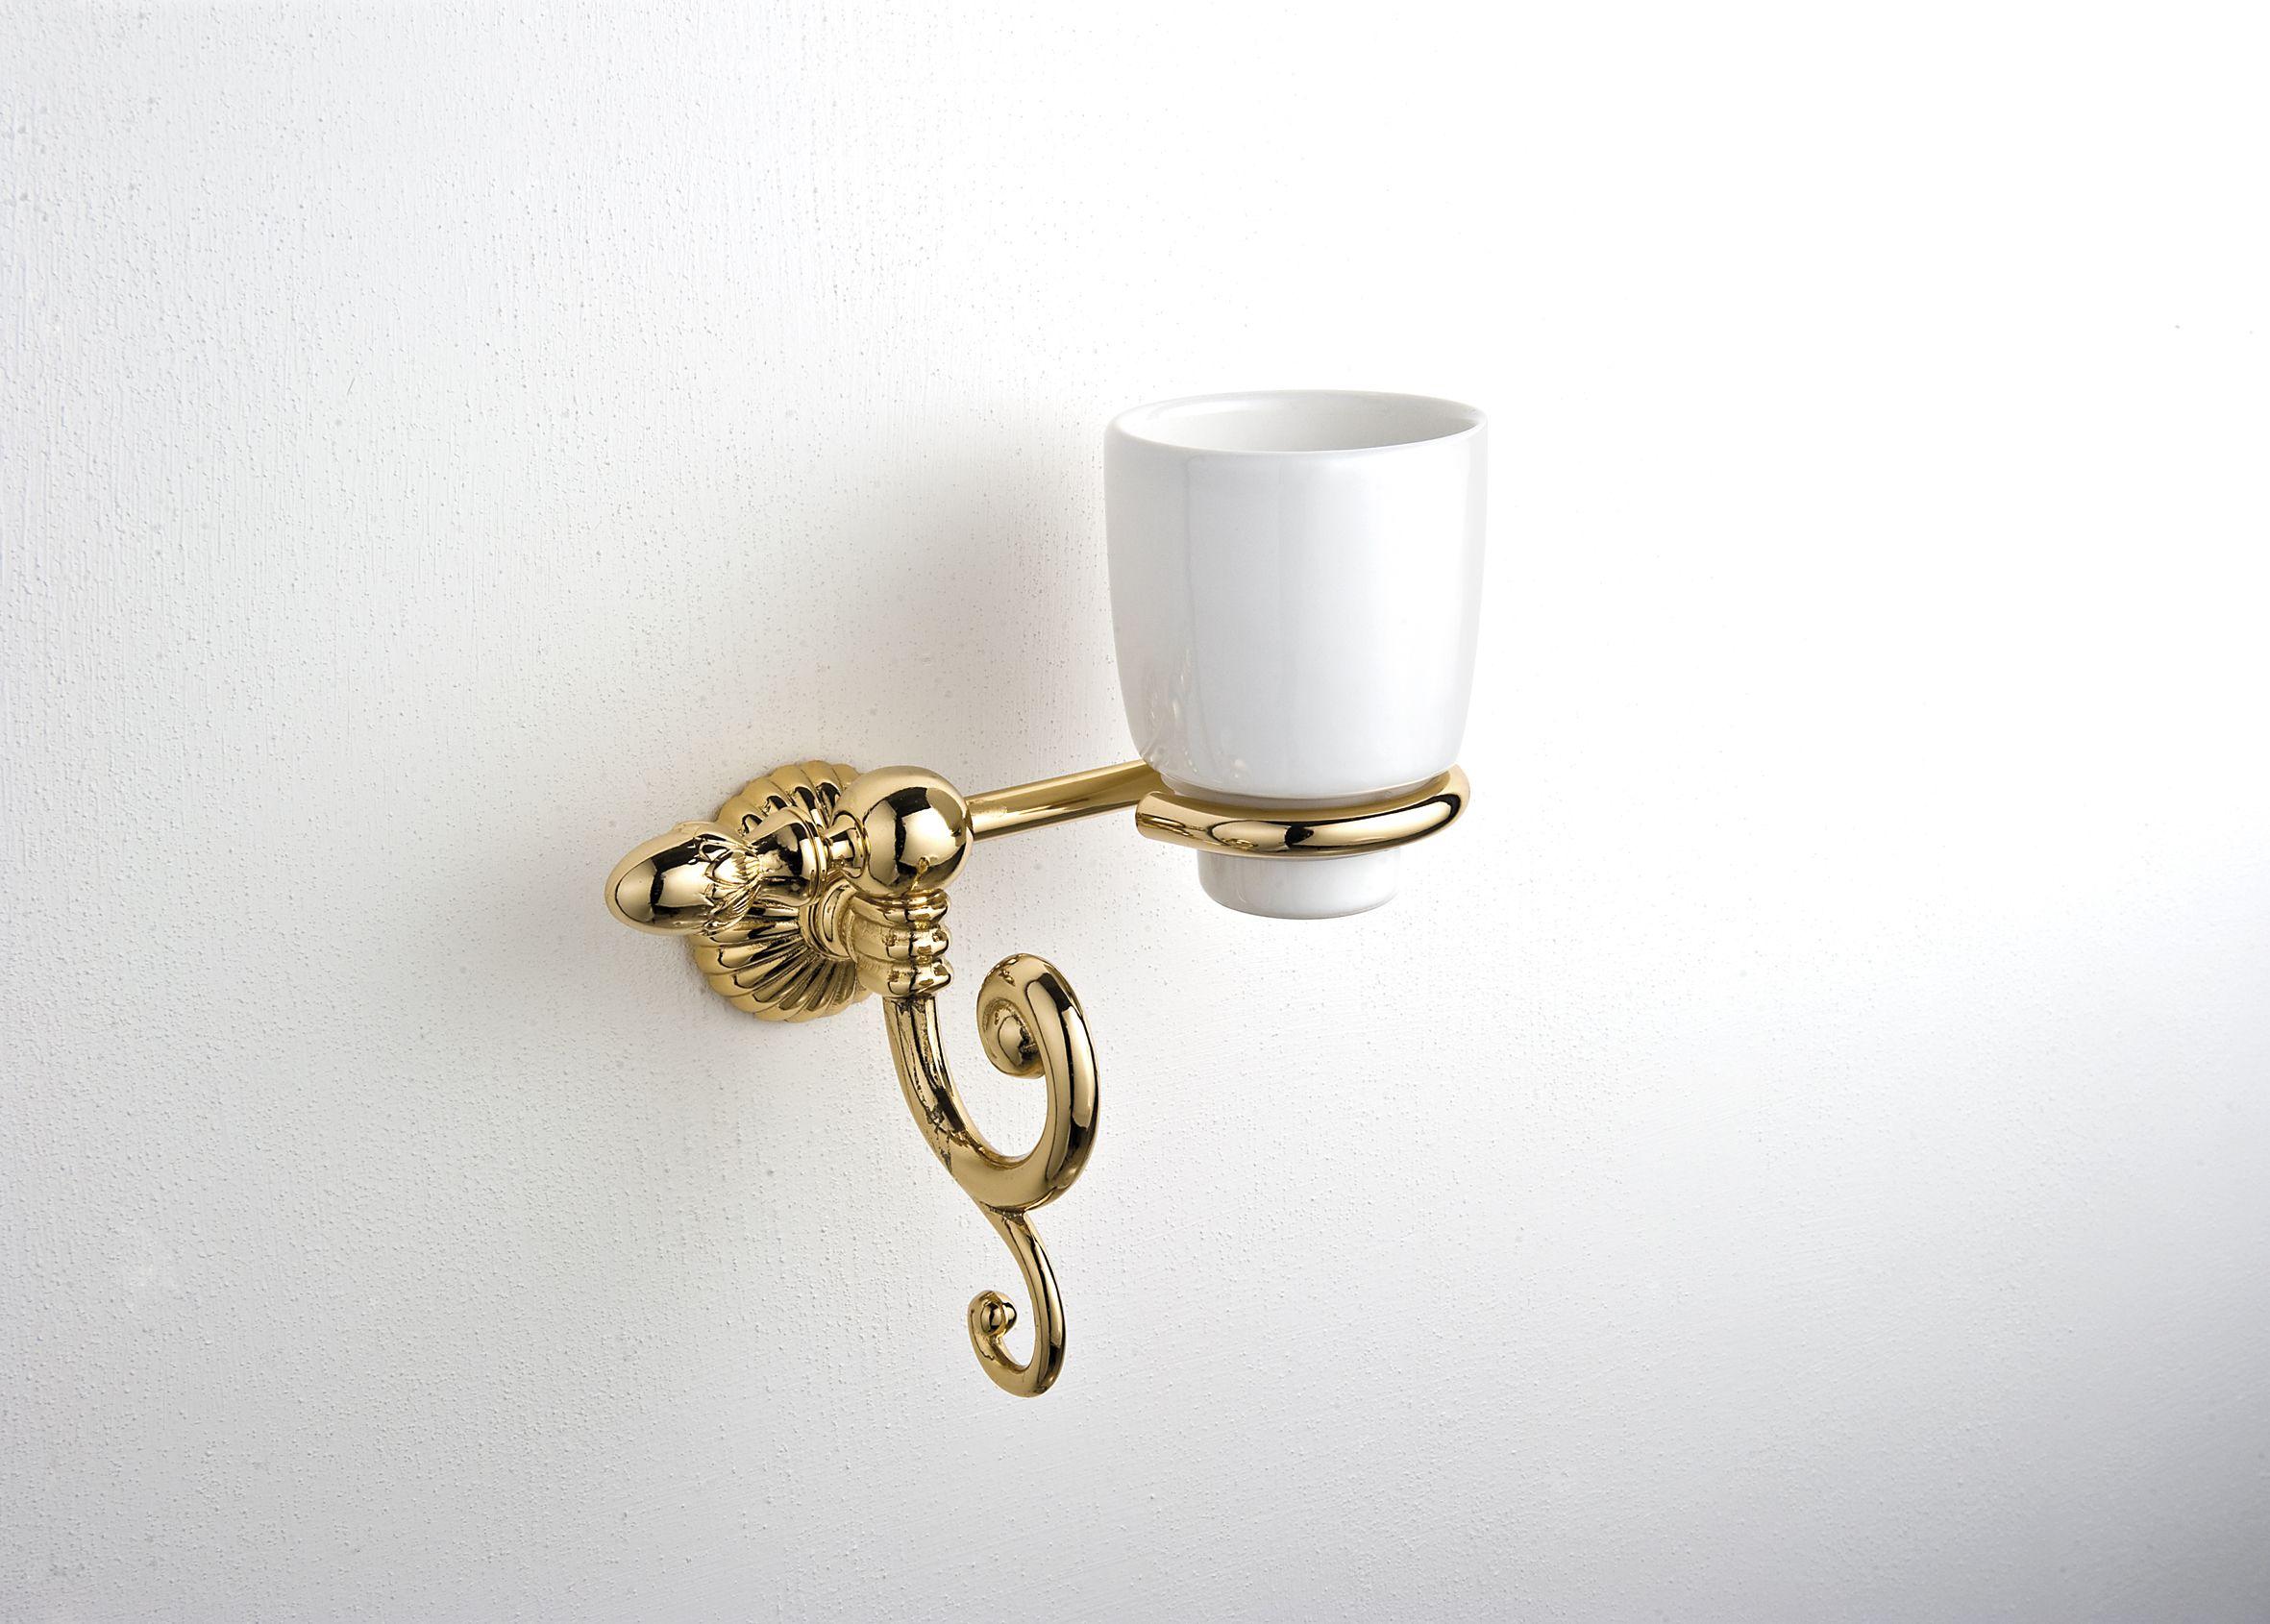 accesoires antik serie gold keramik zahnputzbecher. Black Bedroom Furniture Sets. Home Design Ideas